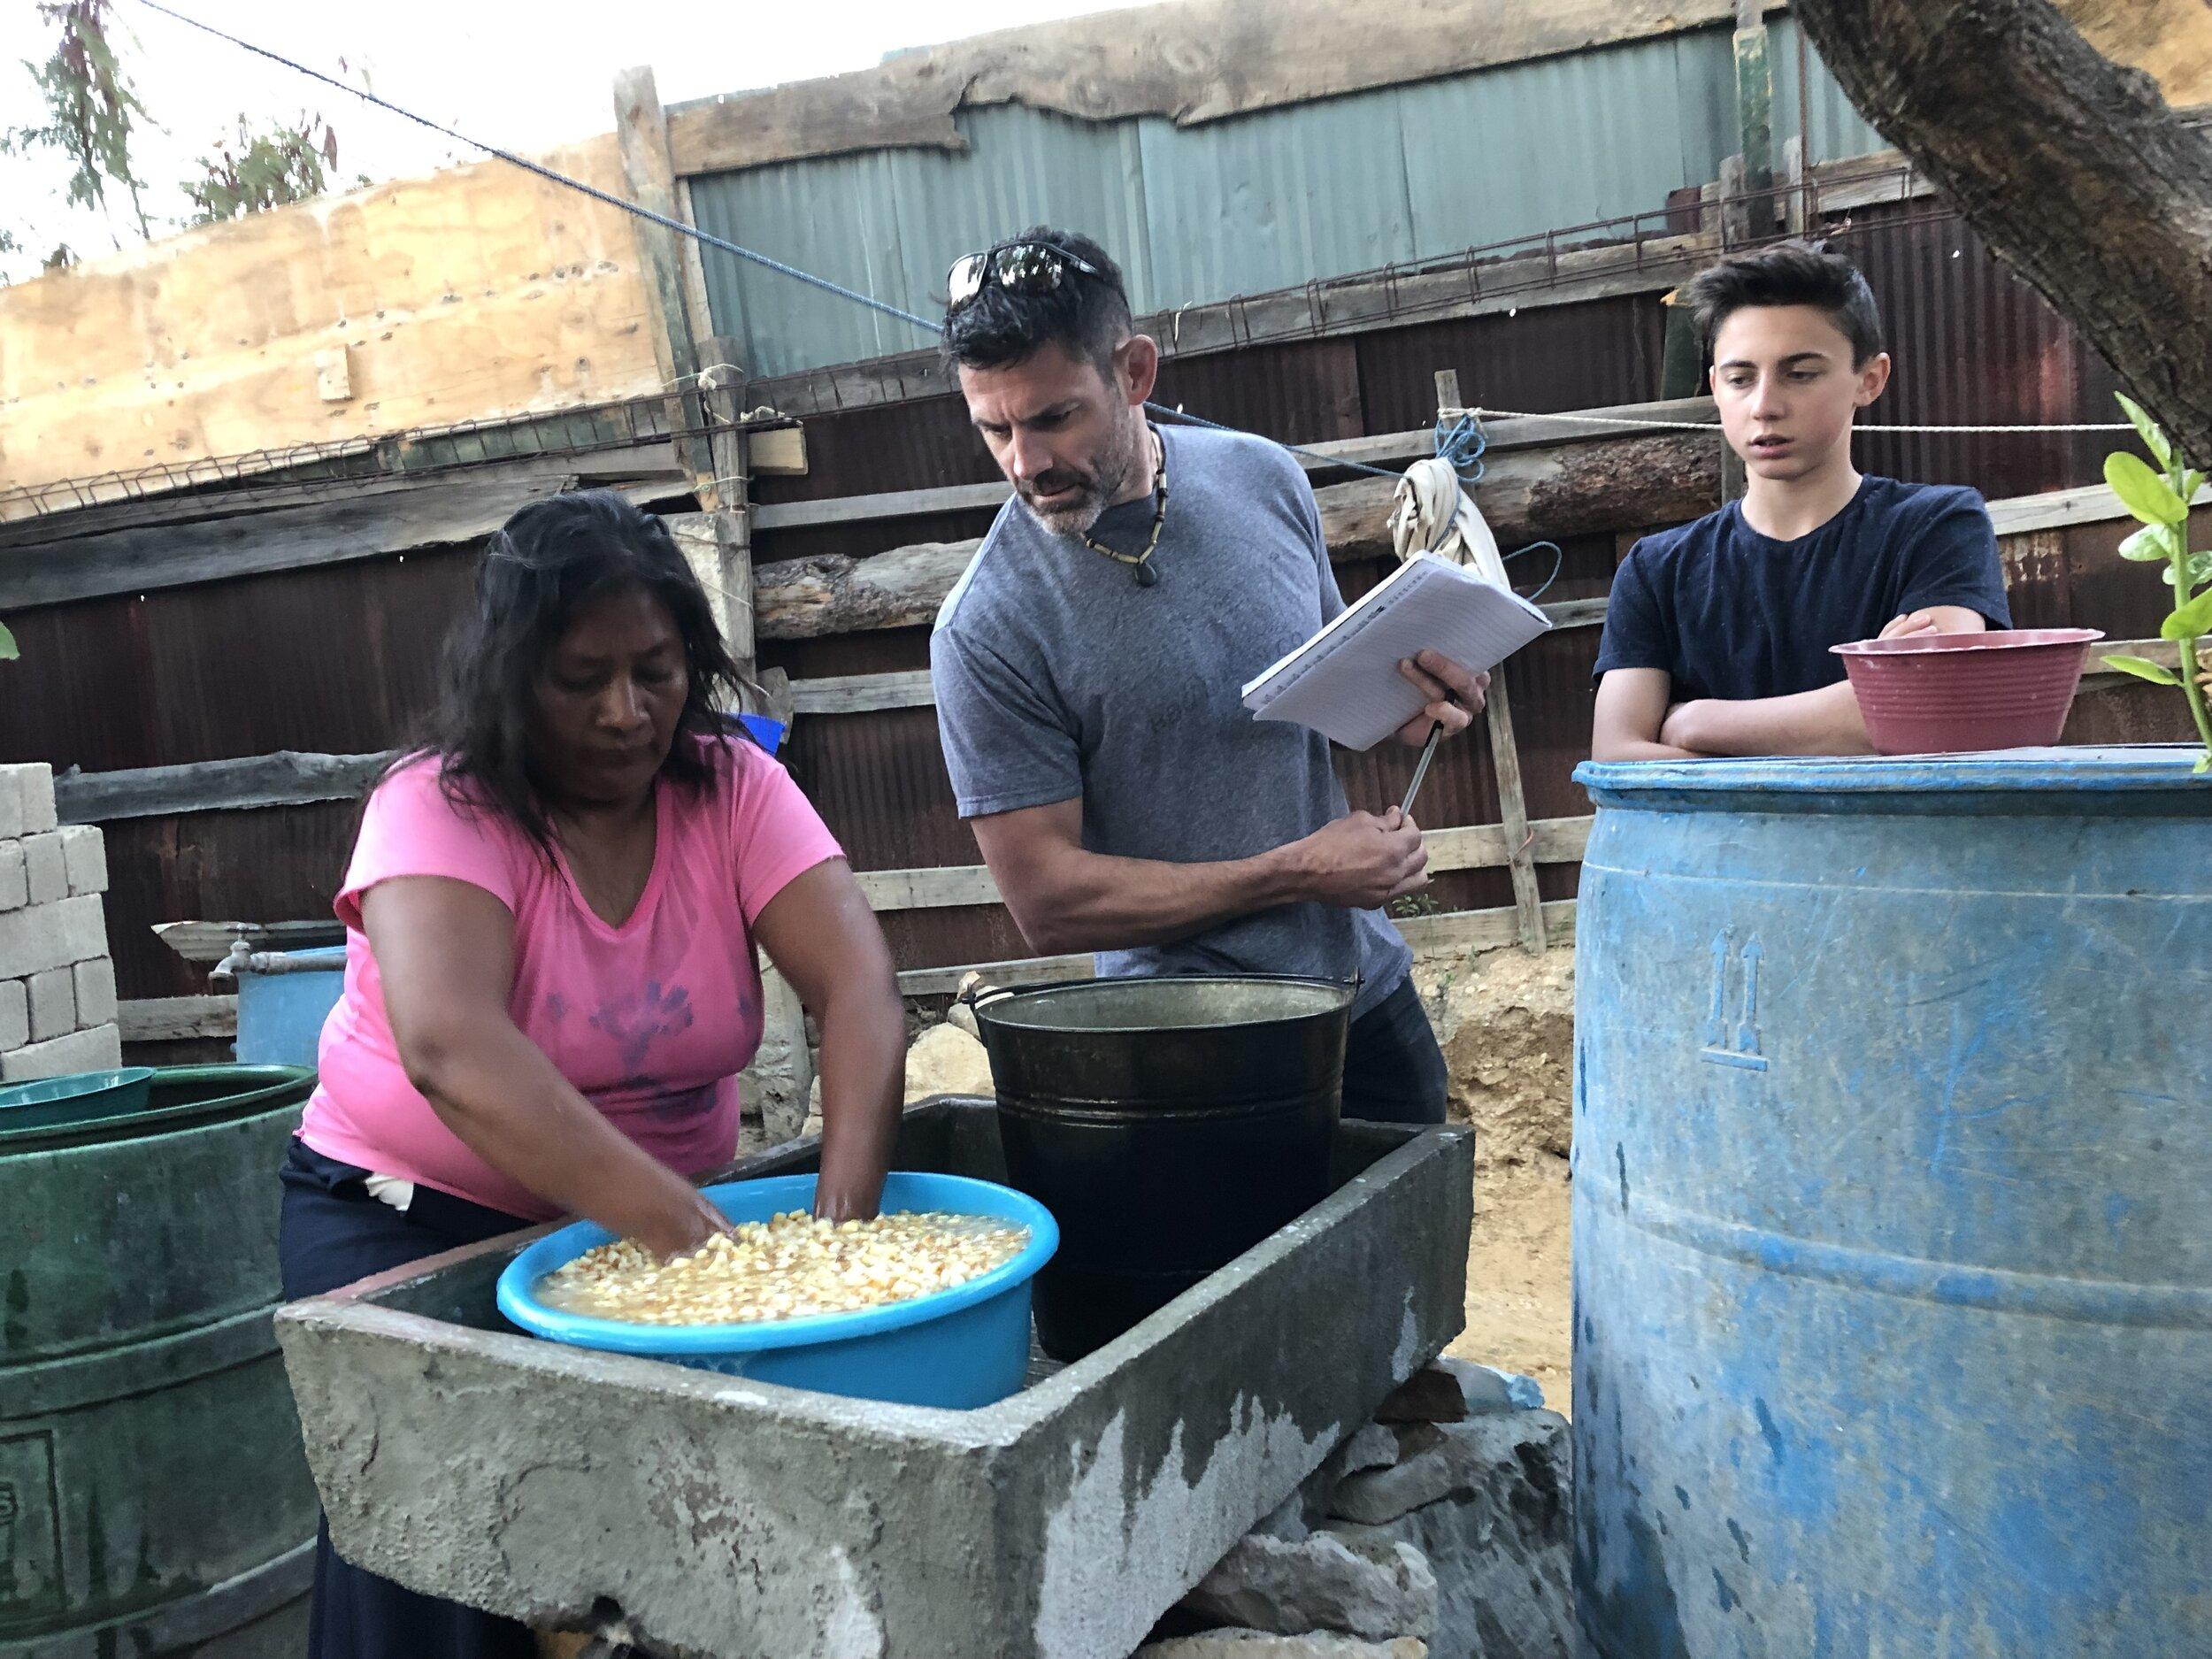 Nixtamilizing in moutains of Oaxaca